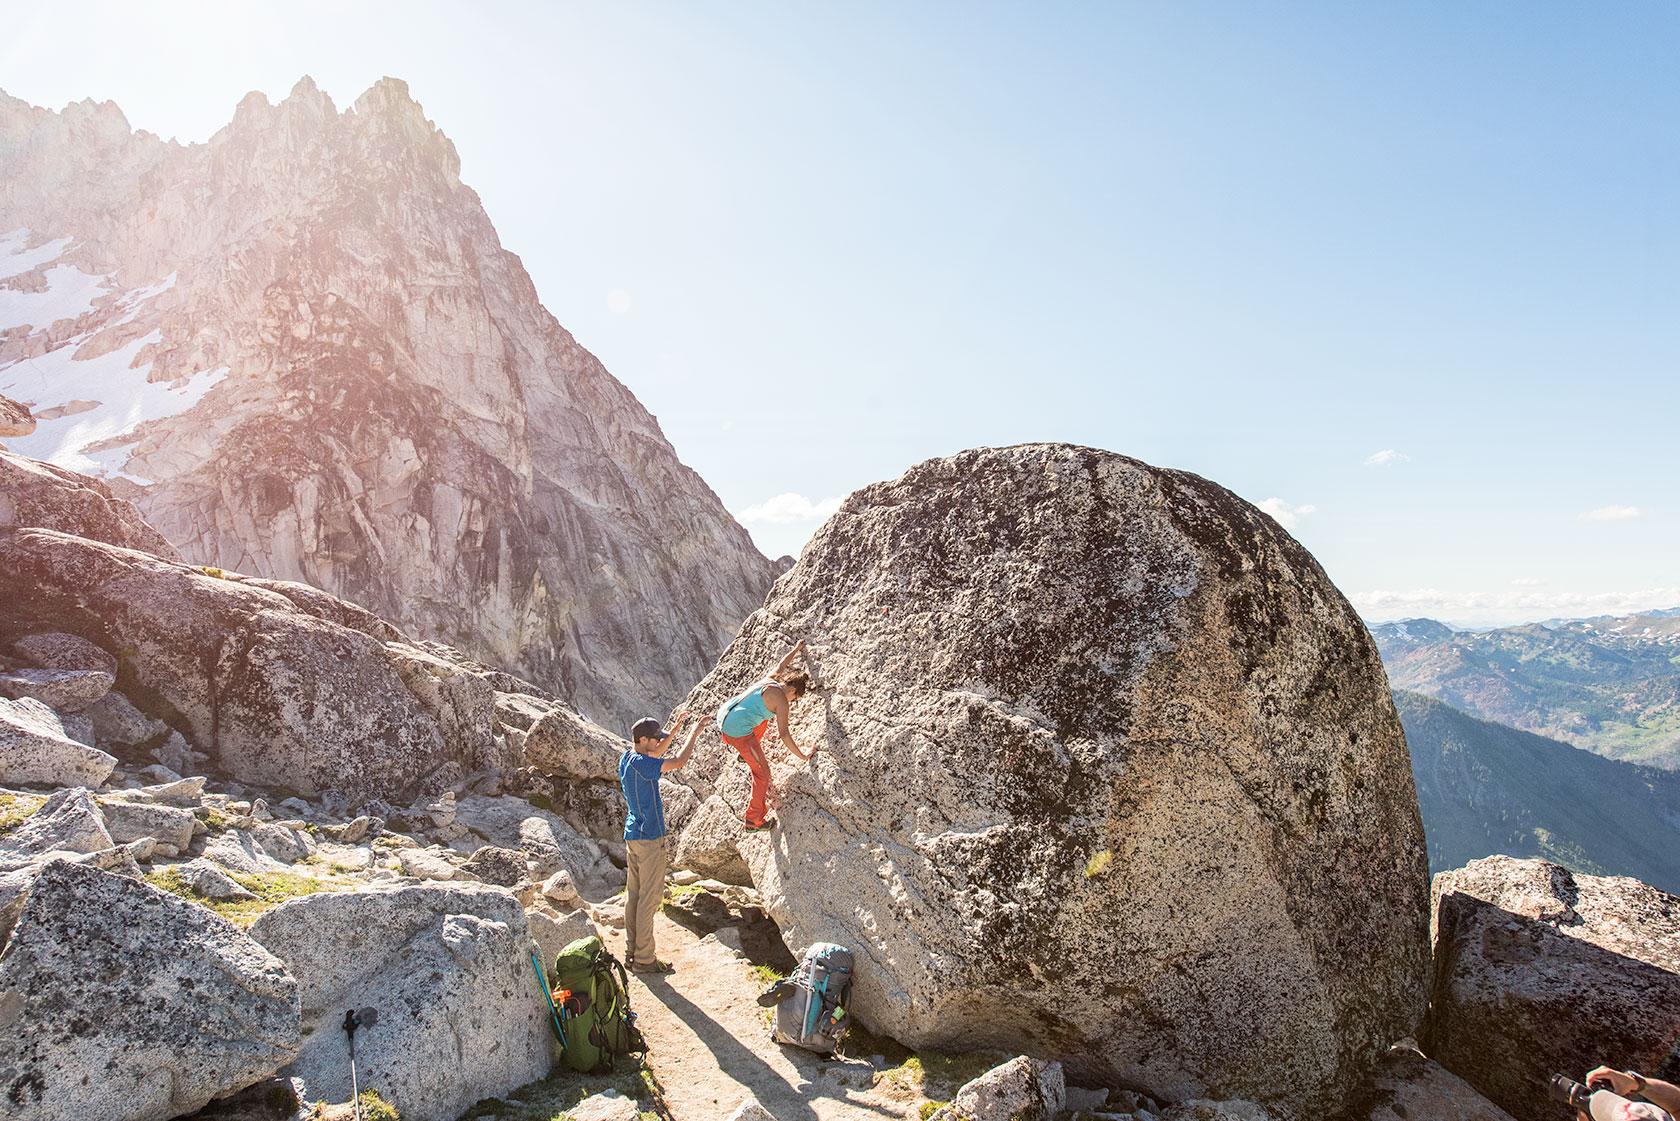 austin-trigg-osprey-hiking-backpacks-washington-lifestyle-morning-adventure-outdoor-active-hike-camp-sunrise-enchantments-rock-climbing.jpg